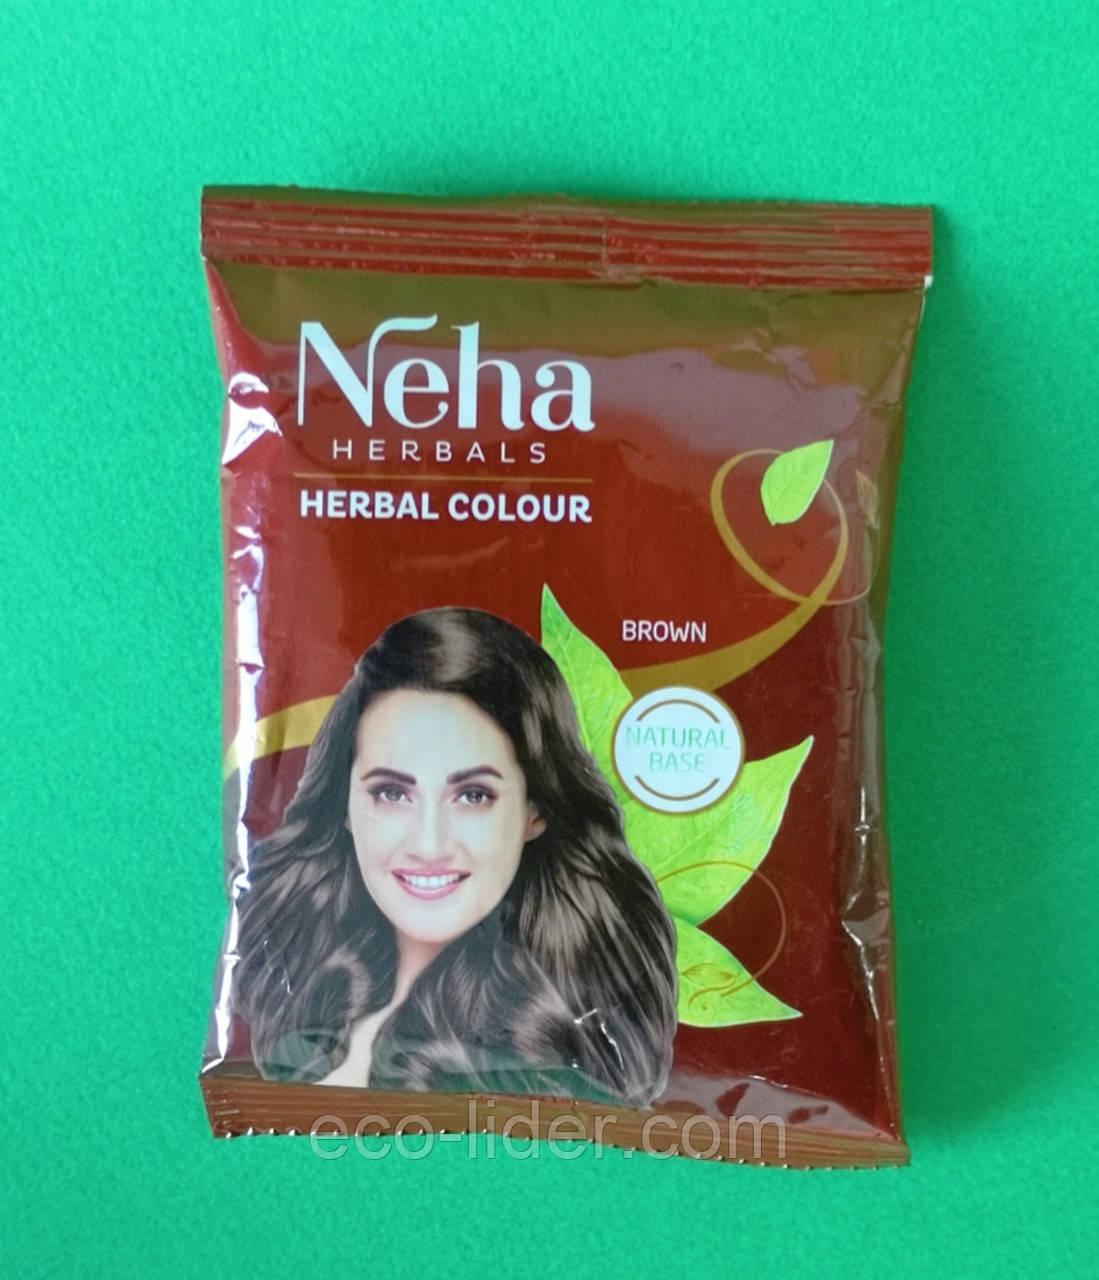 Хна для волос Neha Herbals Brown коричневая, 20 г